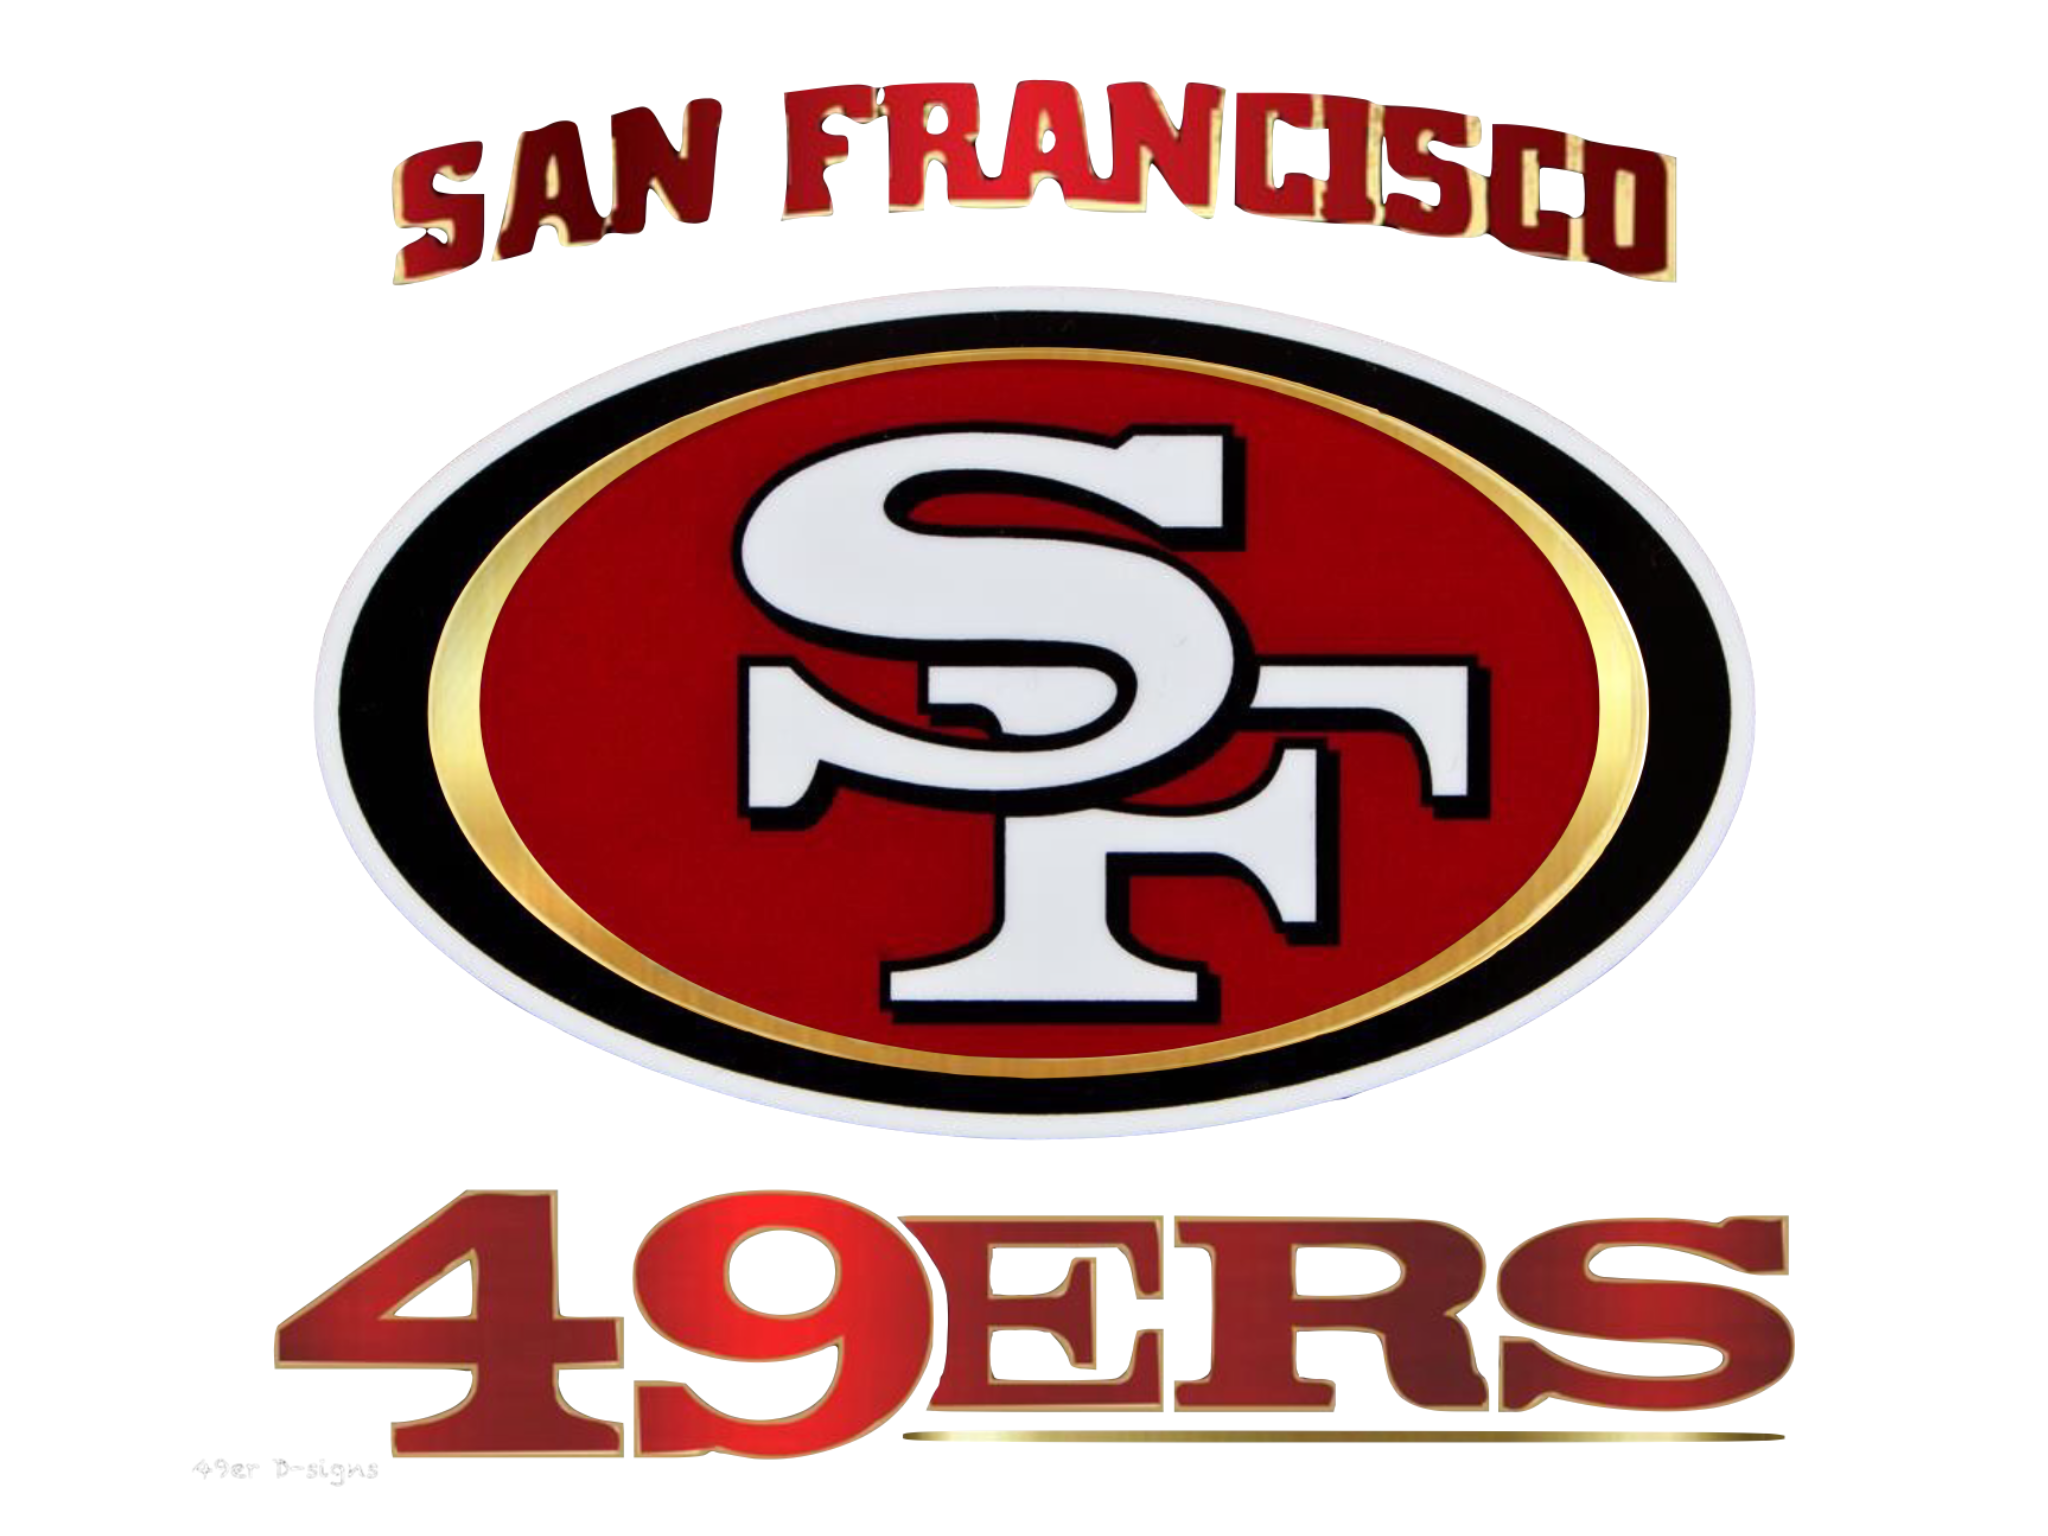 Pin By 49er D Signs On 49er Logos Sports Team Logos Nfl Football Art Nfl Logo